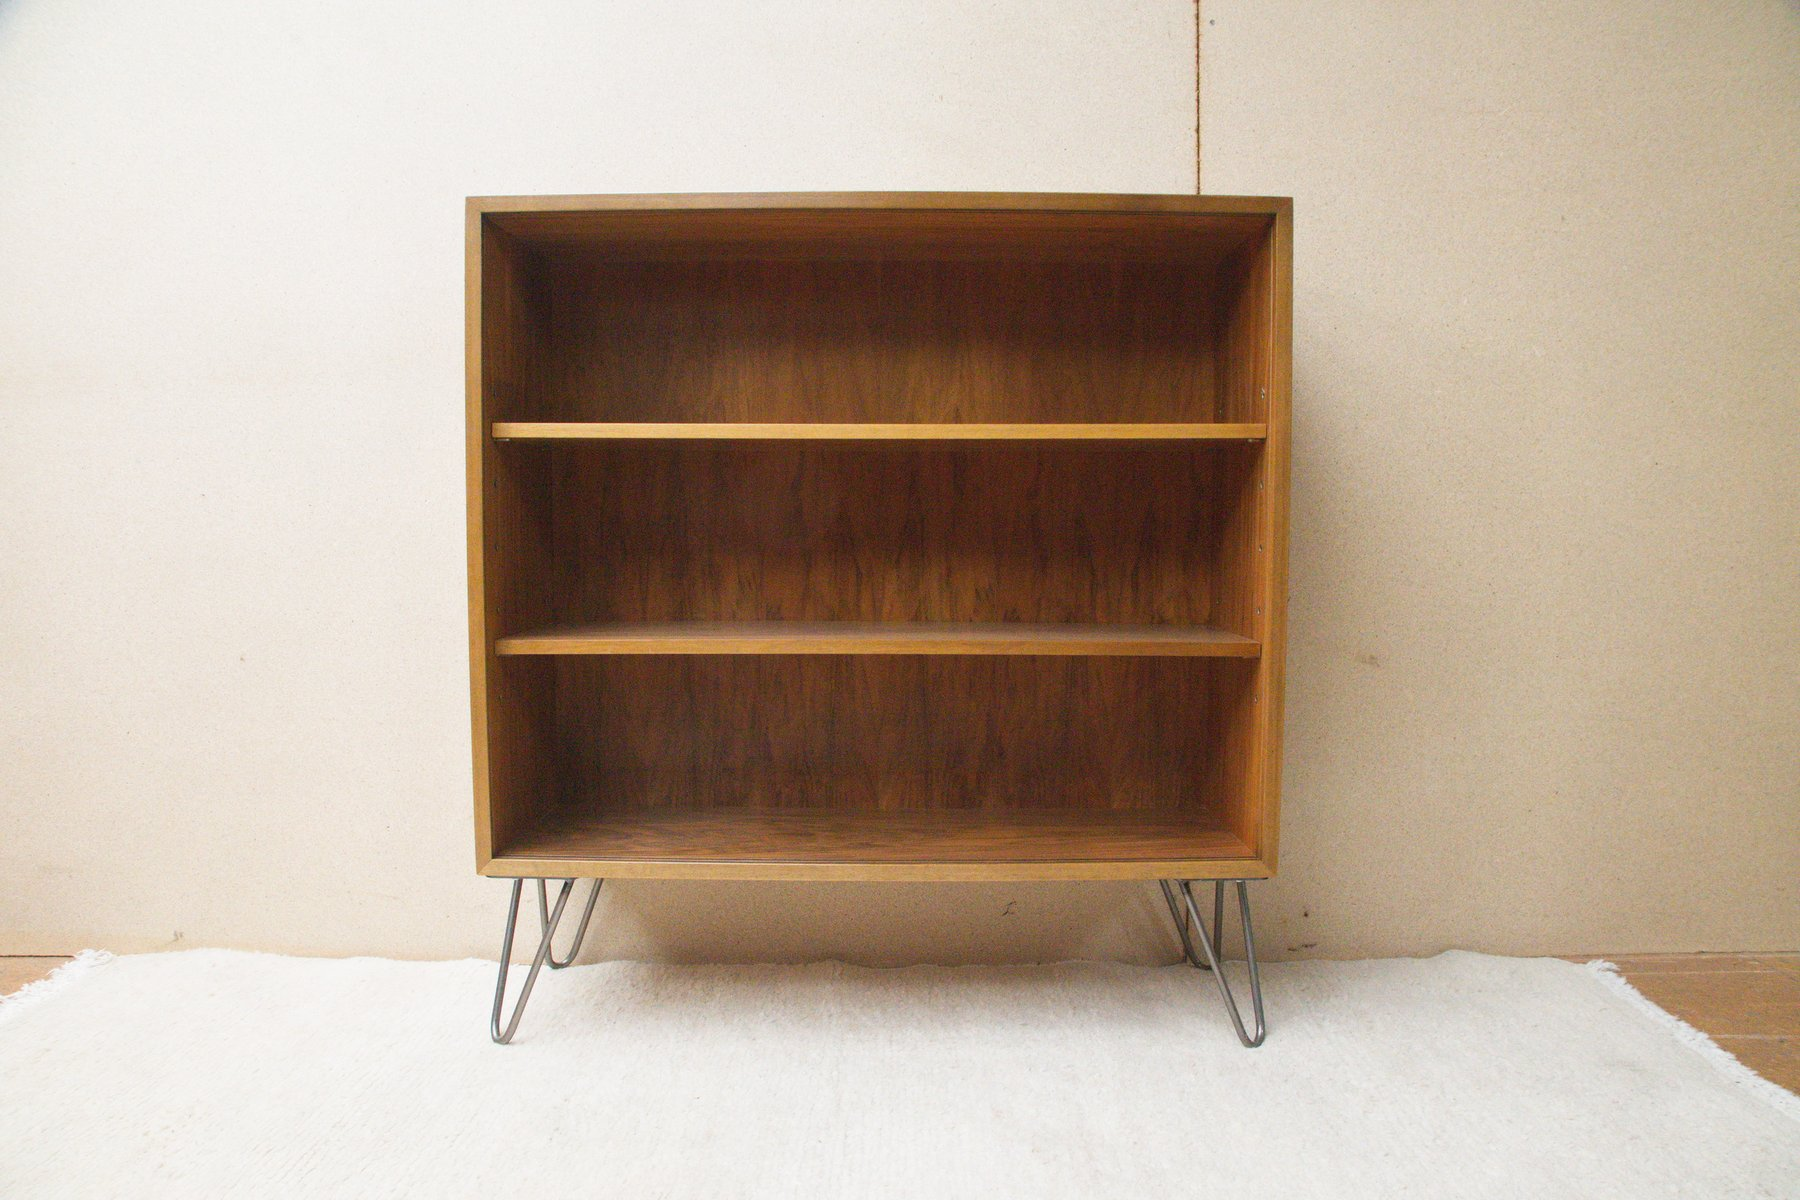 vintage b cherregal aus nussholz von georg satink f r wk. Black Bedroom Furniture Sets. Home Design Ideas